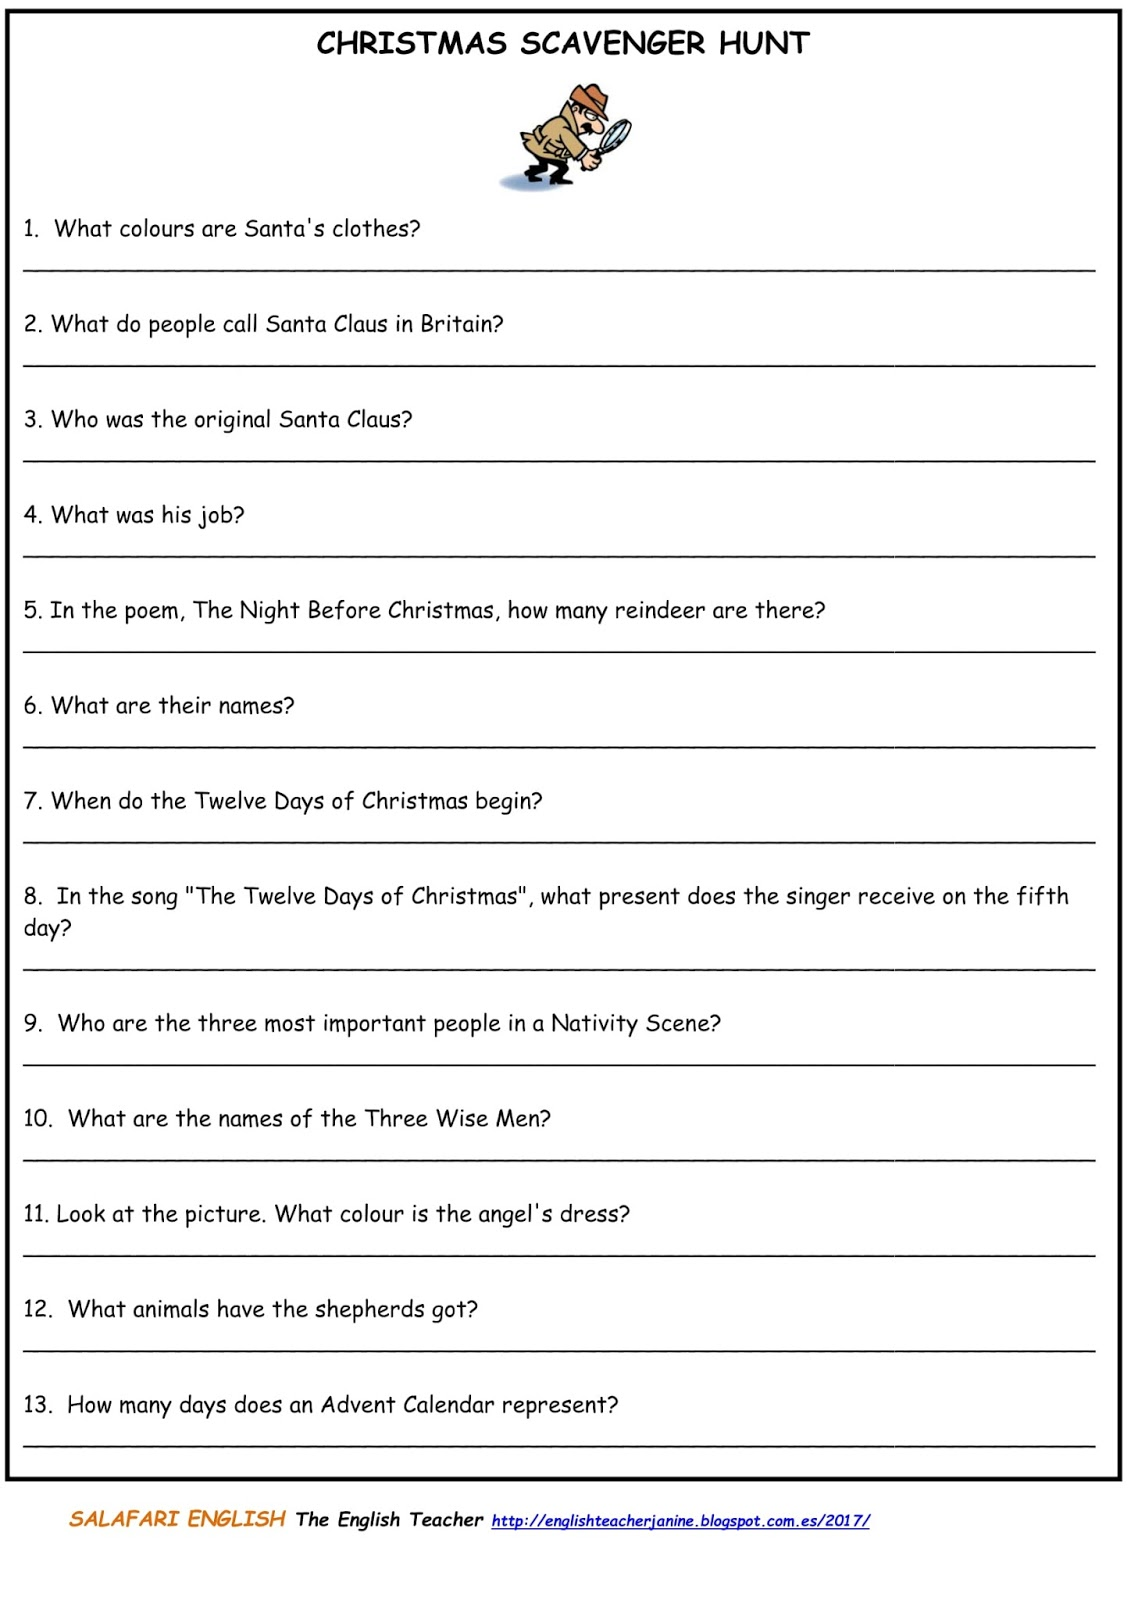 The English Teacher Christmas Activities A1